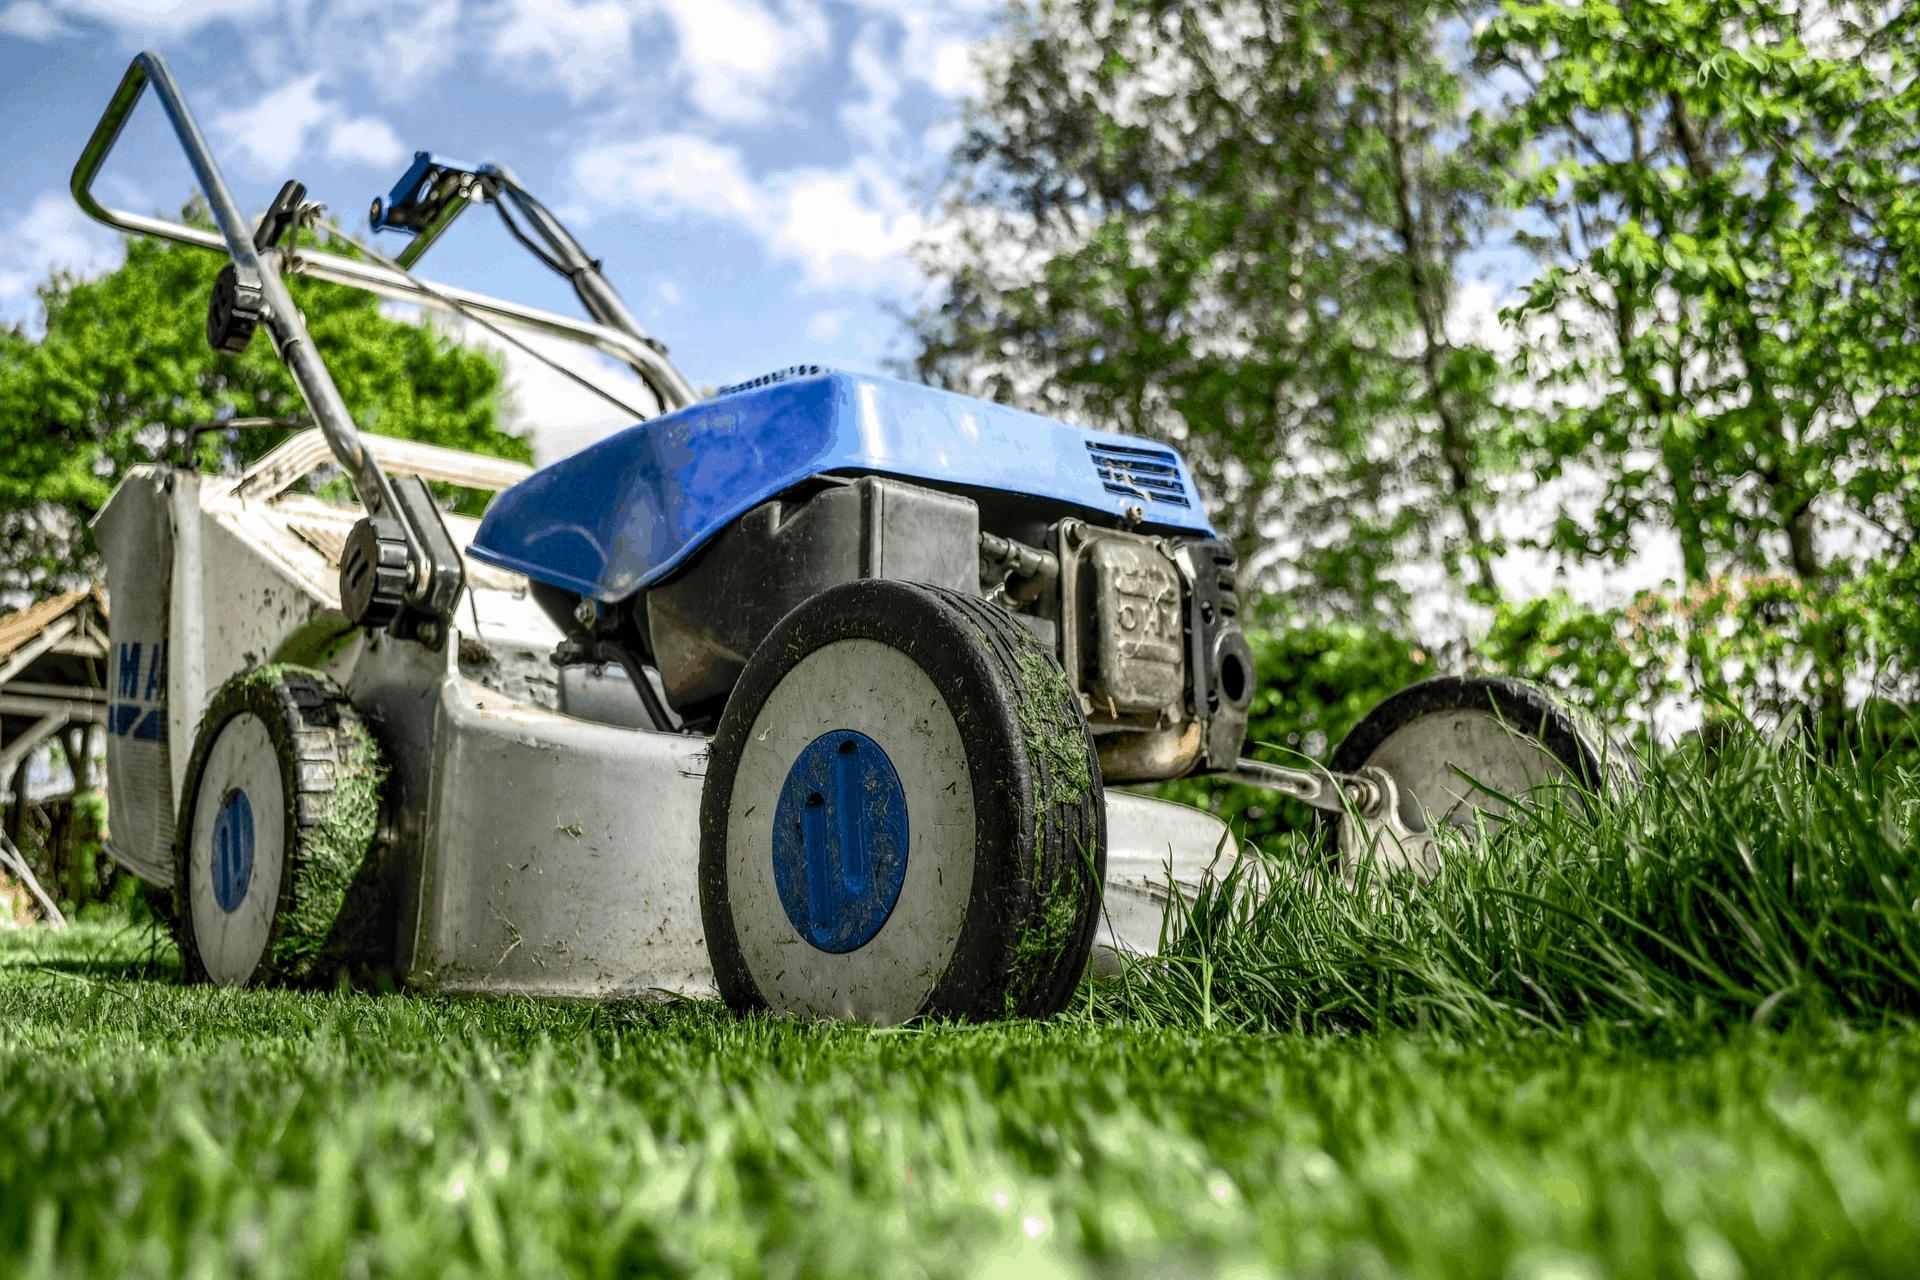 lawnmower 384589 1920